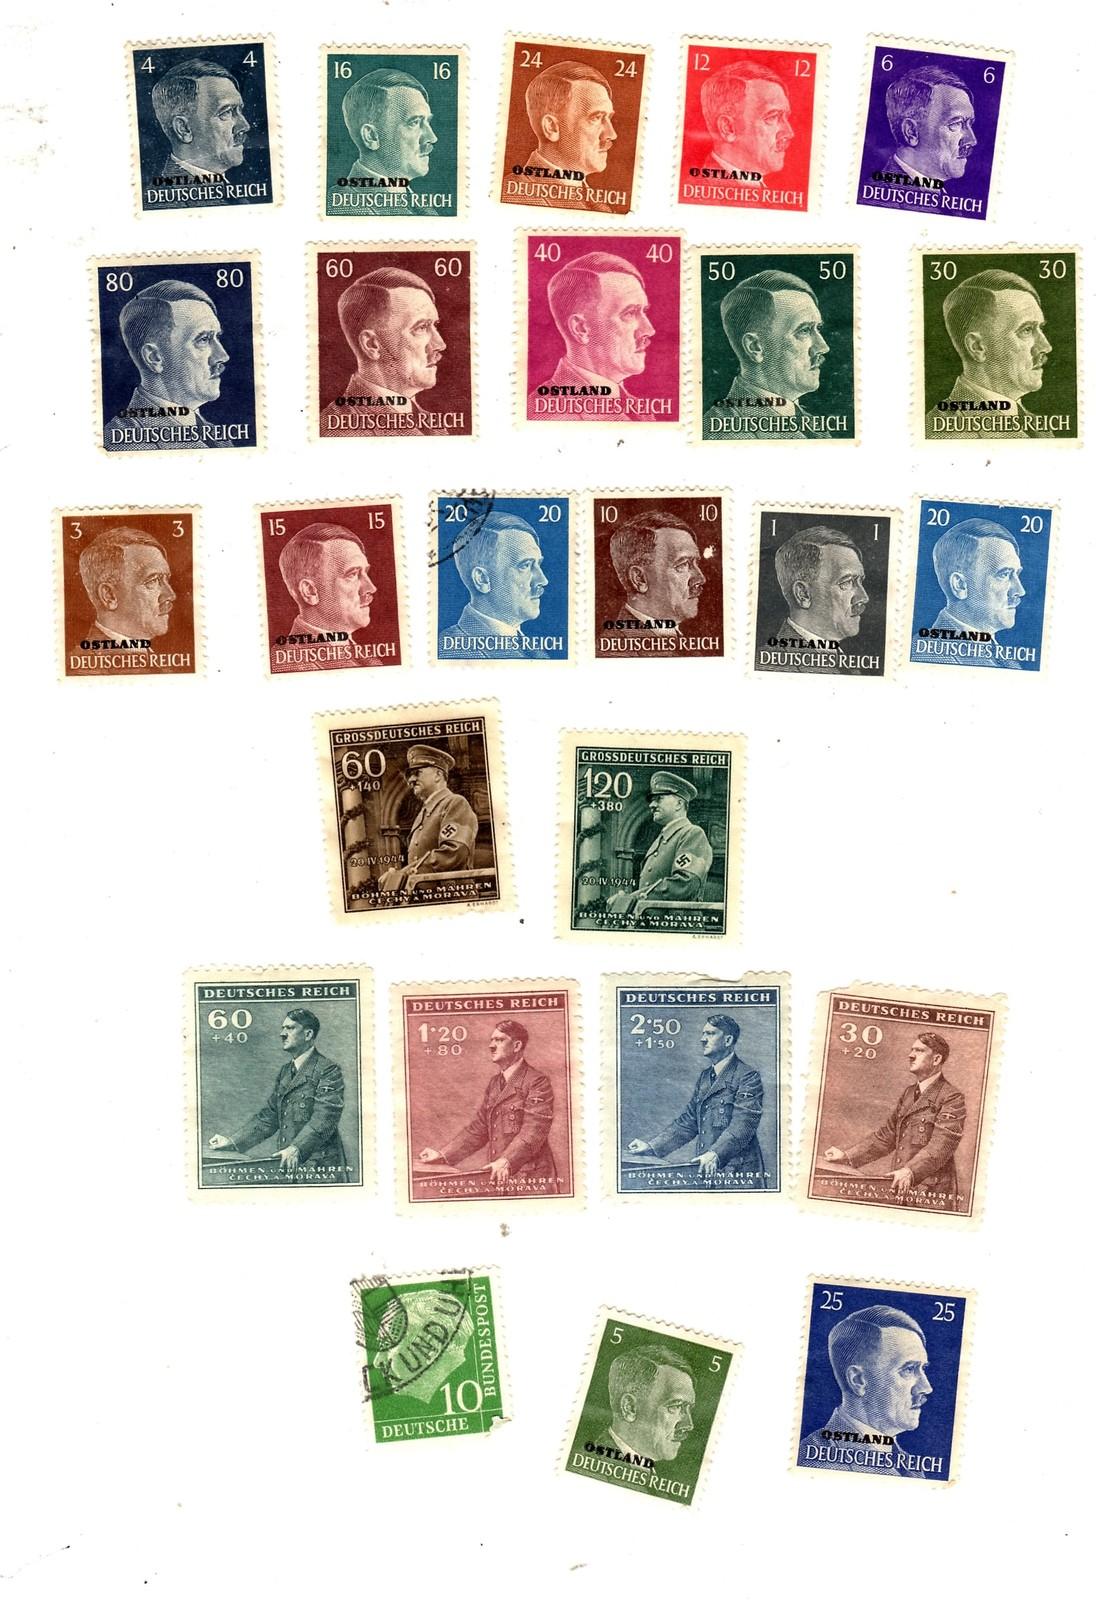 Stamps - Germany- European Postage -Germany (25 vintage stamps) image 9